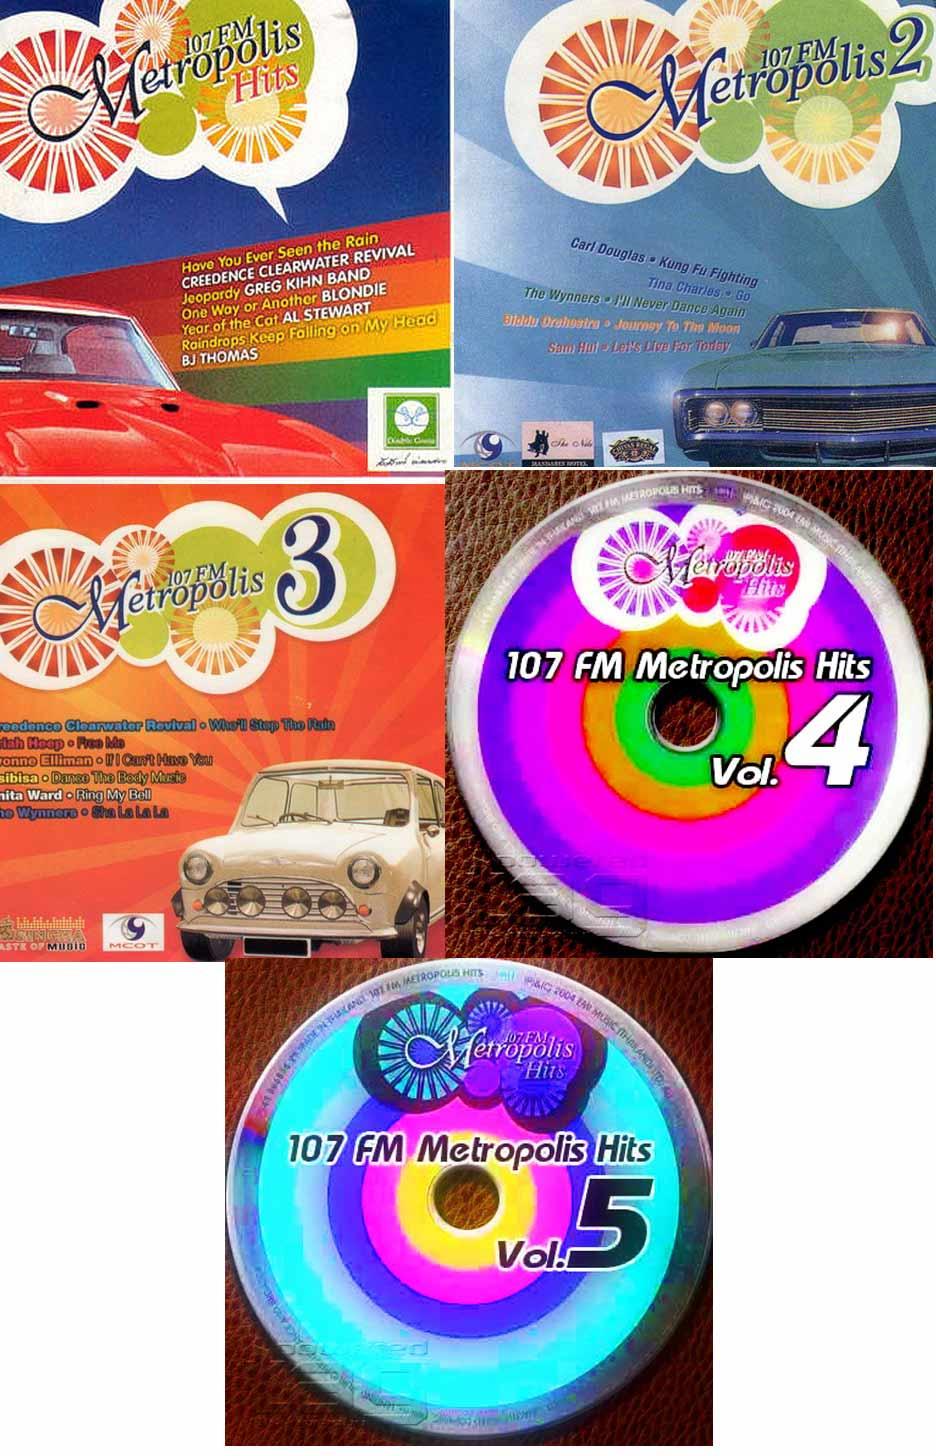 2234 107 Fm Metropolis Hits Vol.1-5